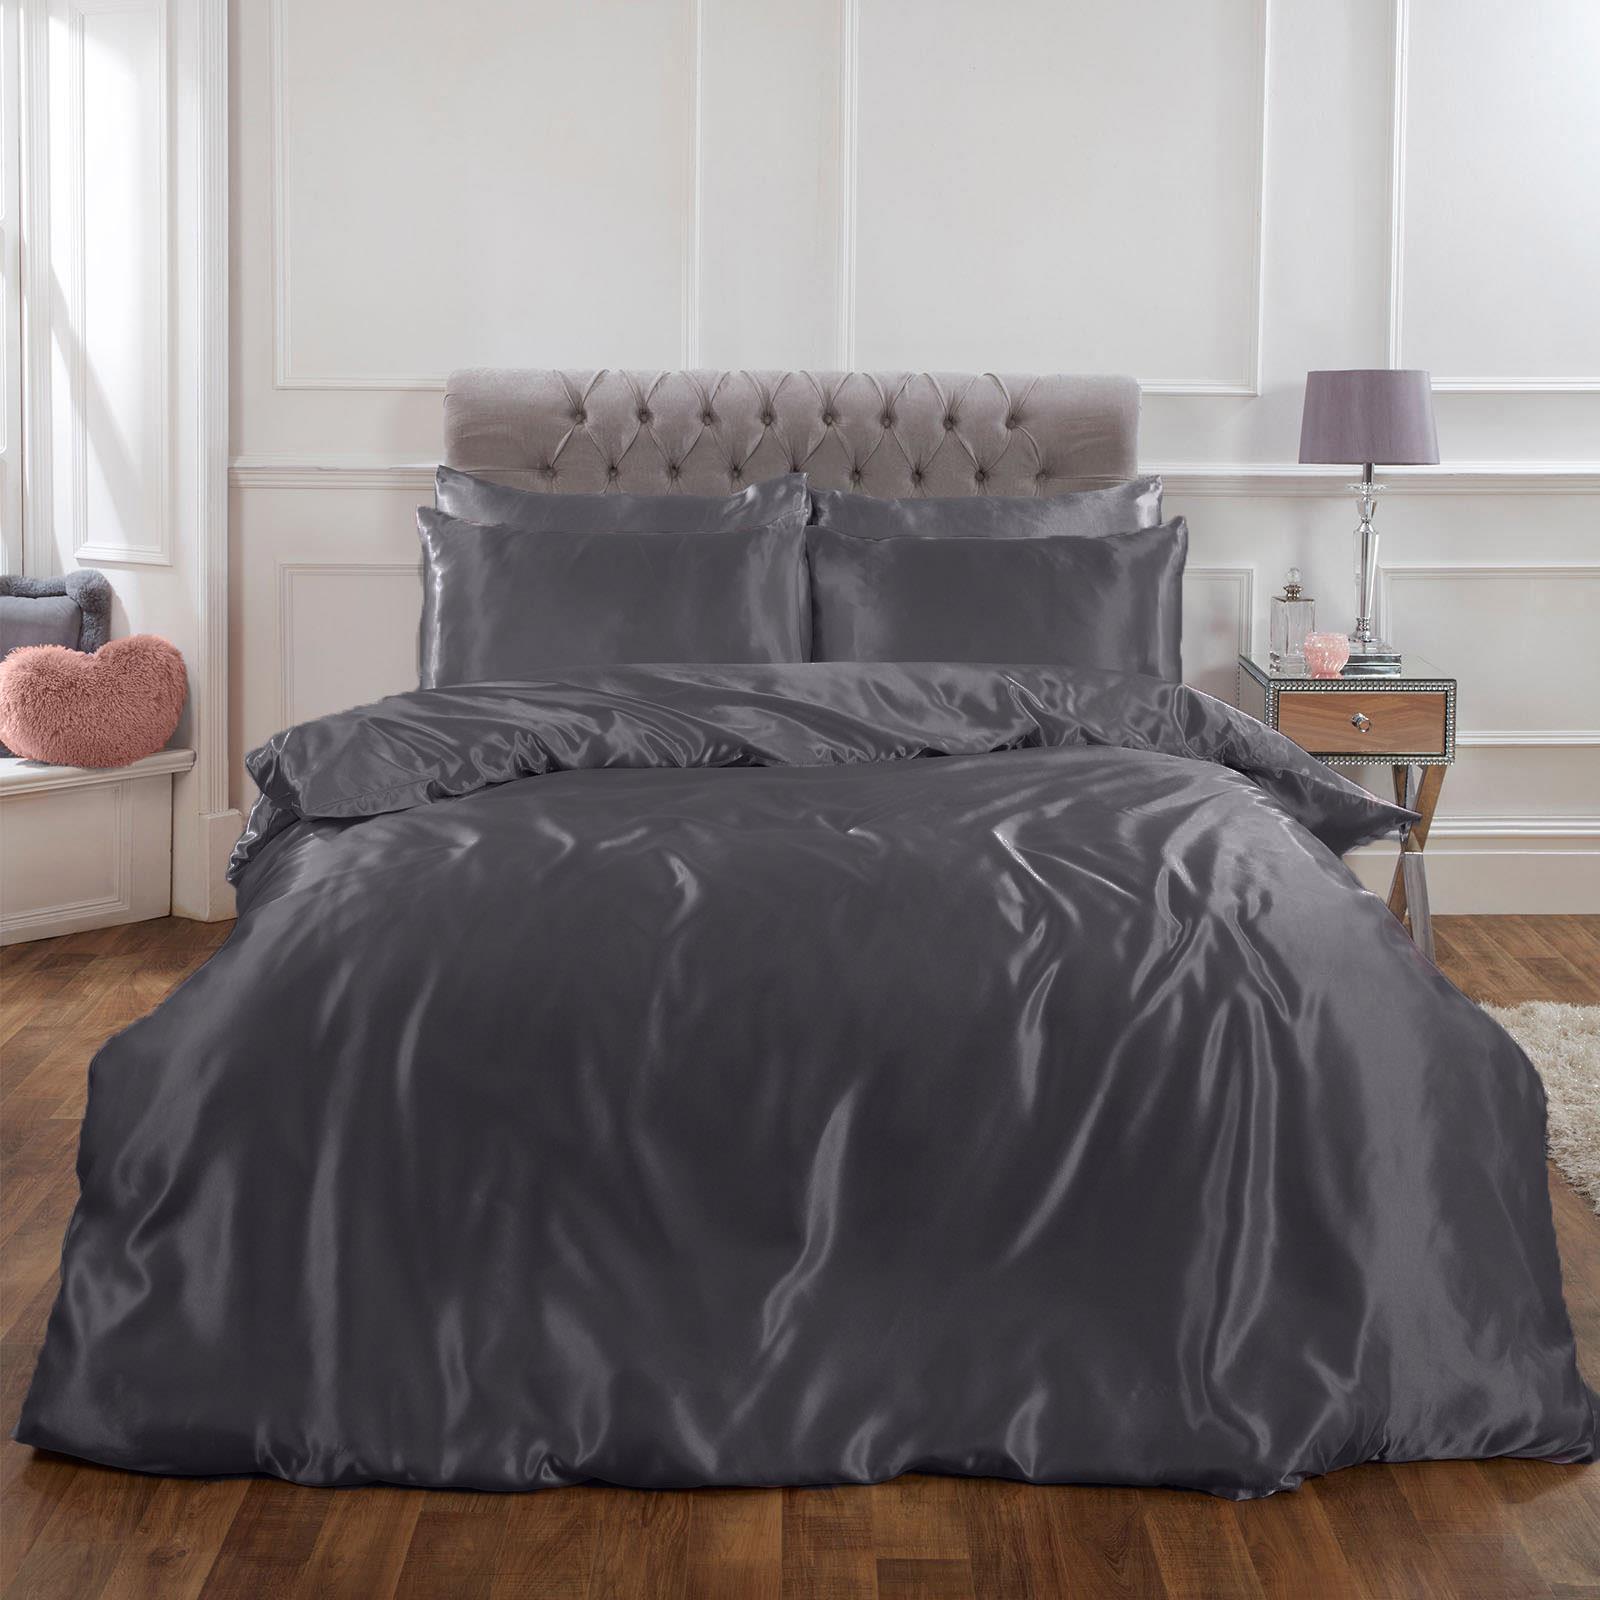 thumbnail 19 - Sienna Satin Silk Duvet Cover with Pillowcases Bedding Set, Blush Pink Silver